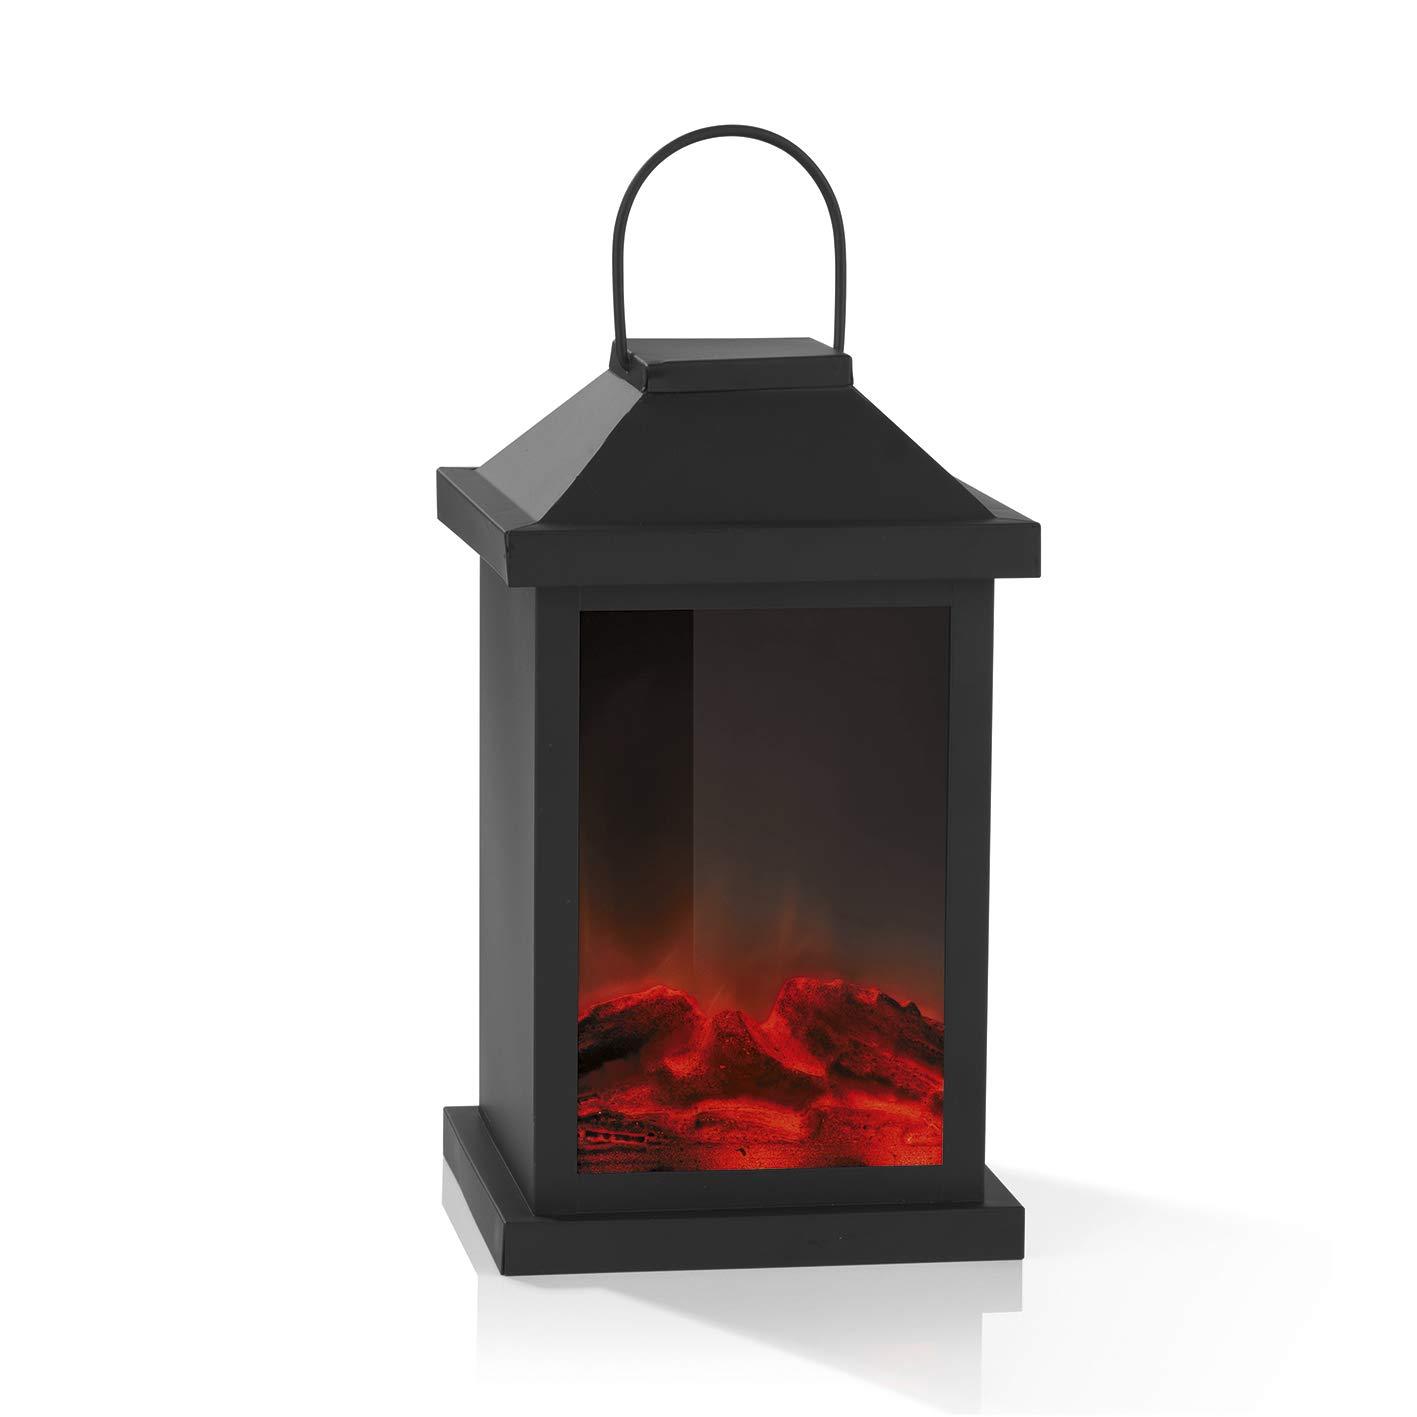 easymaxx deko kamin. Black Bedroom Furniture Sets. Home Design Ideas